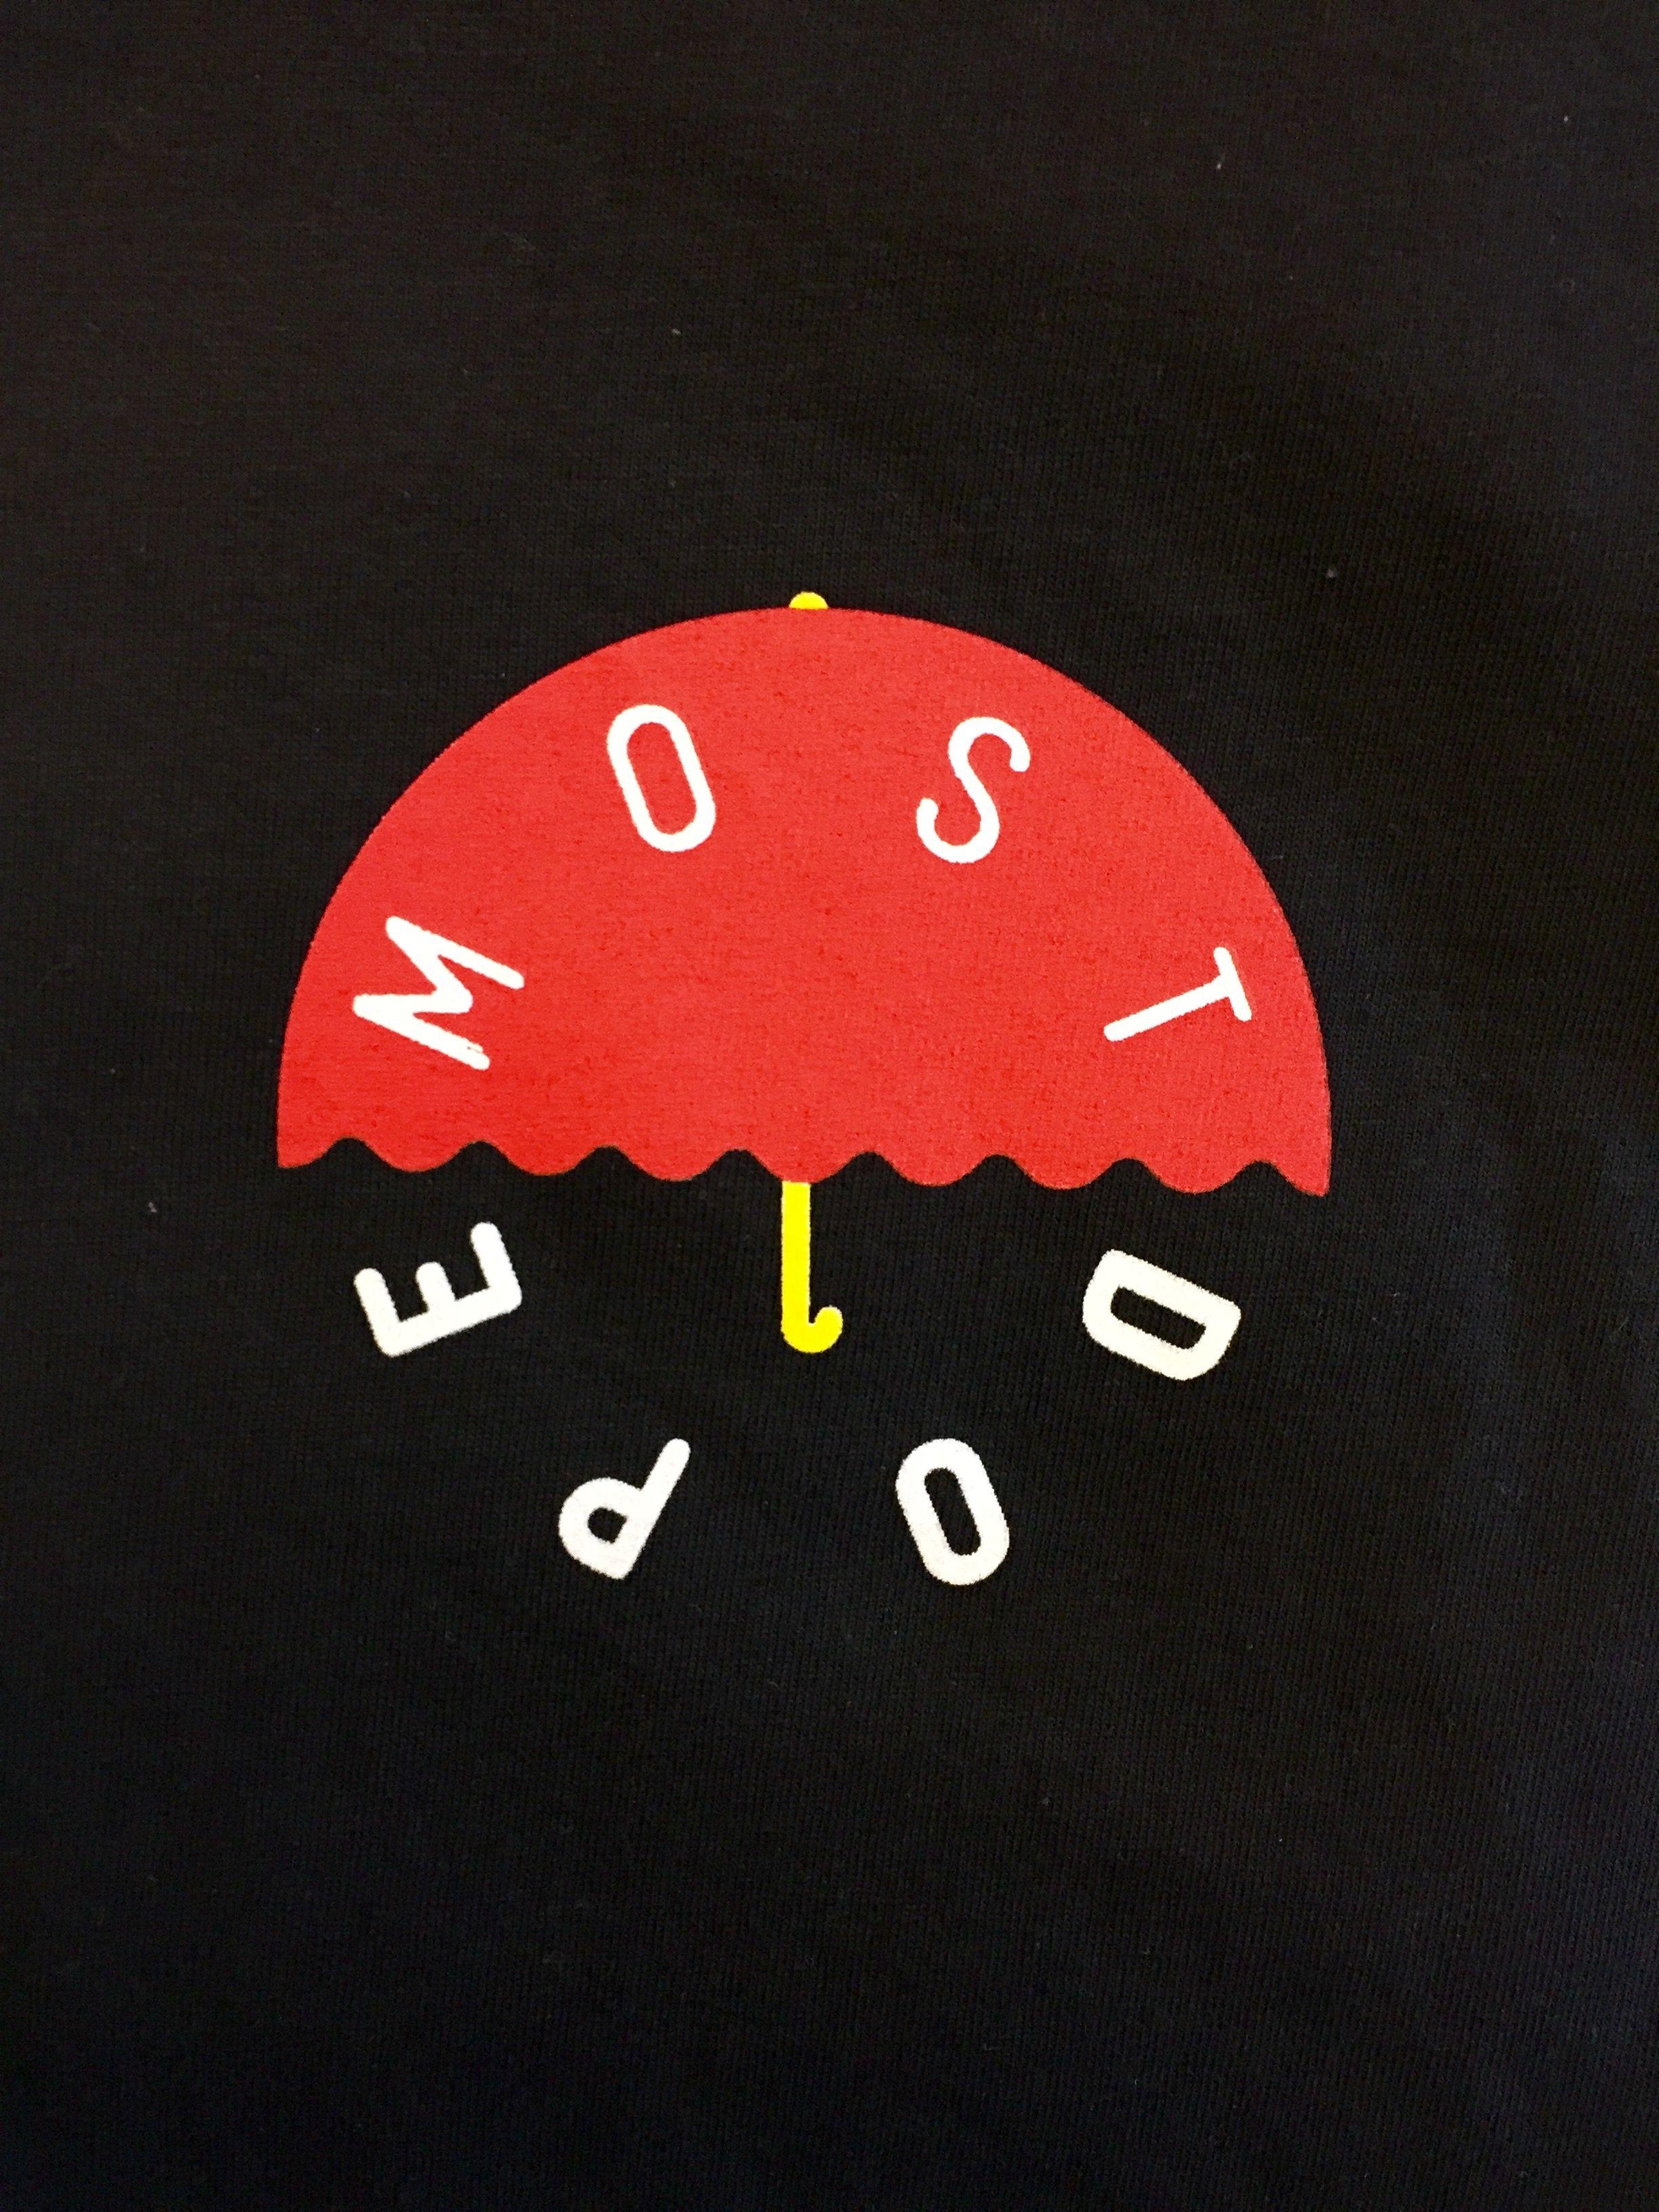 Design t shirt on mac - Most Dope Umbrella T Shirt